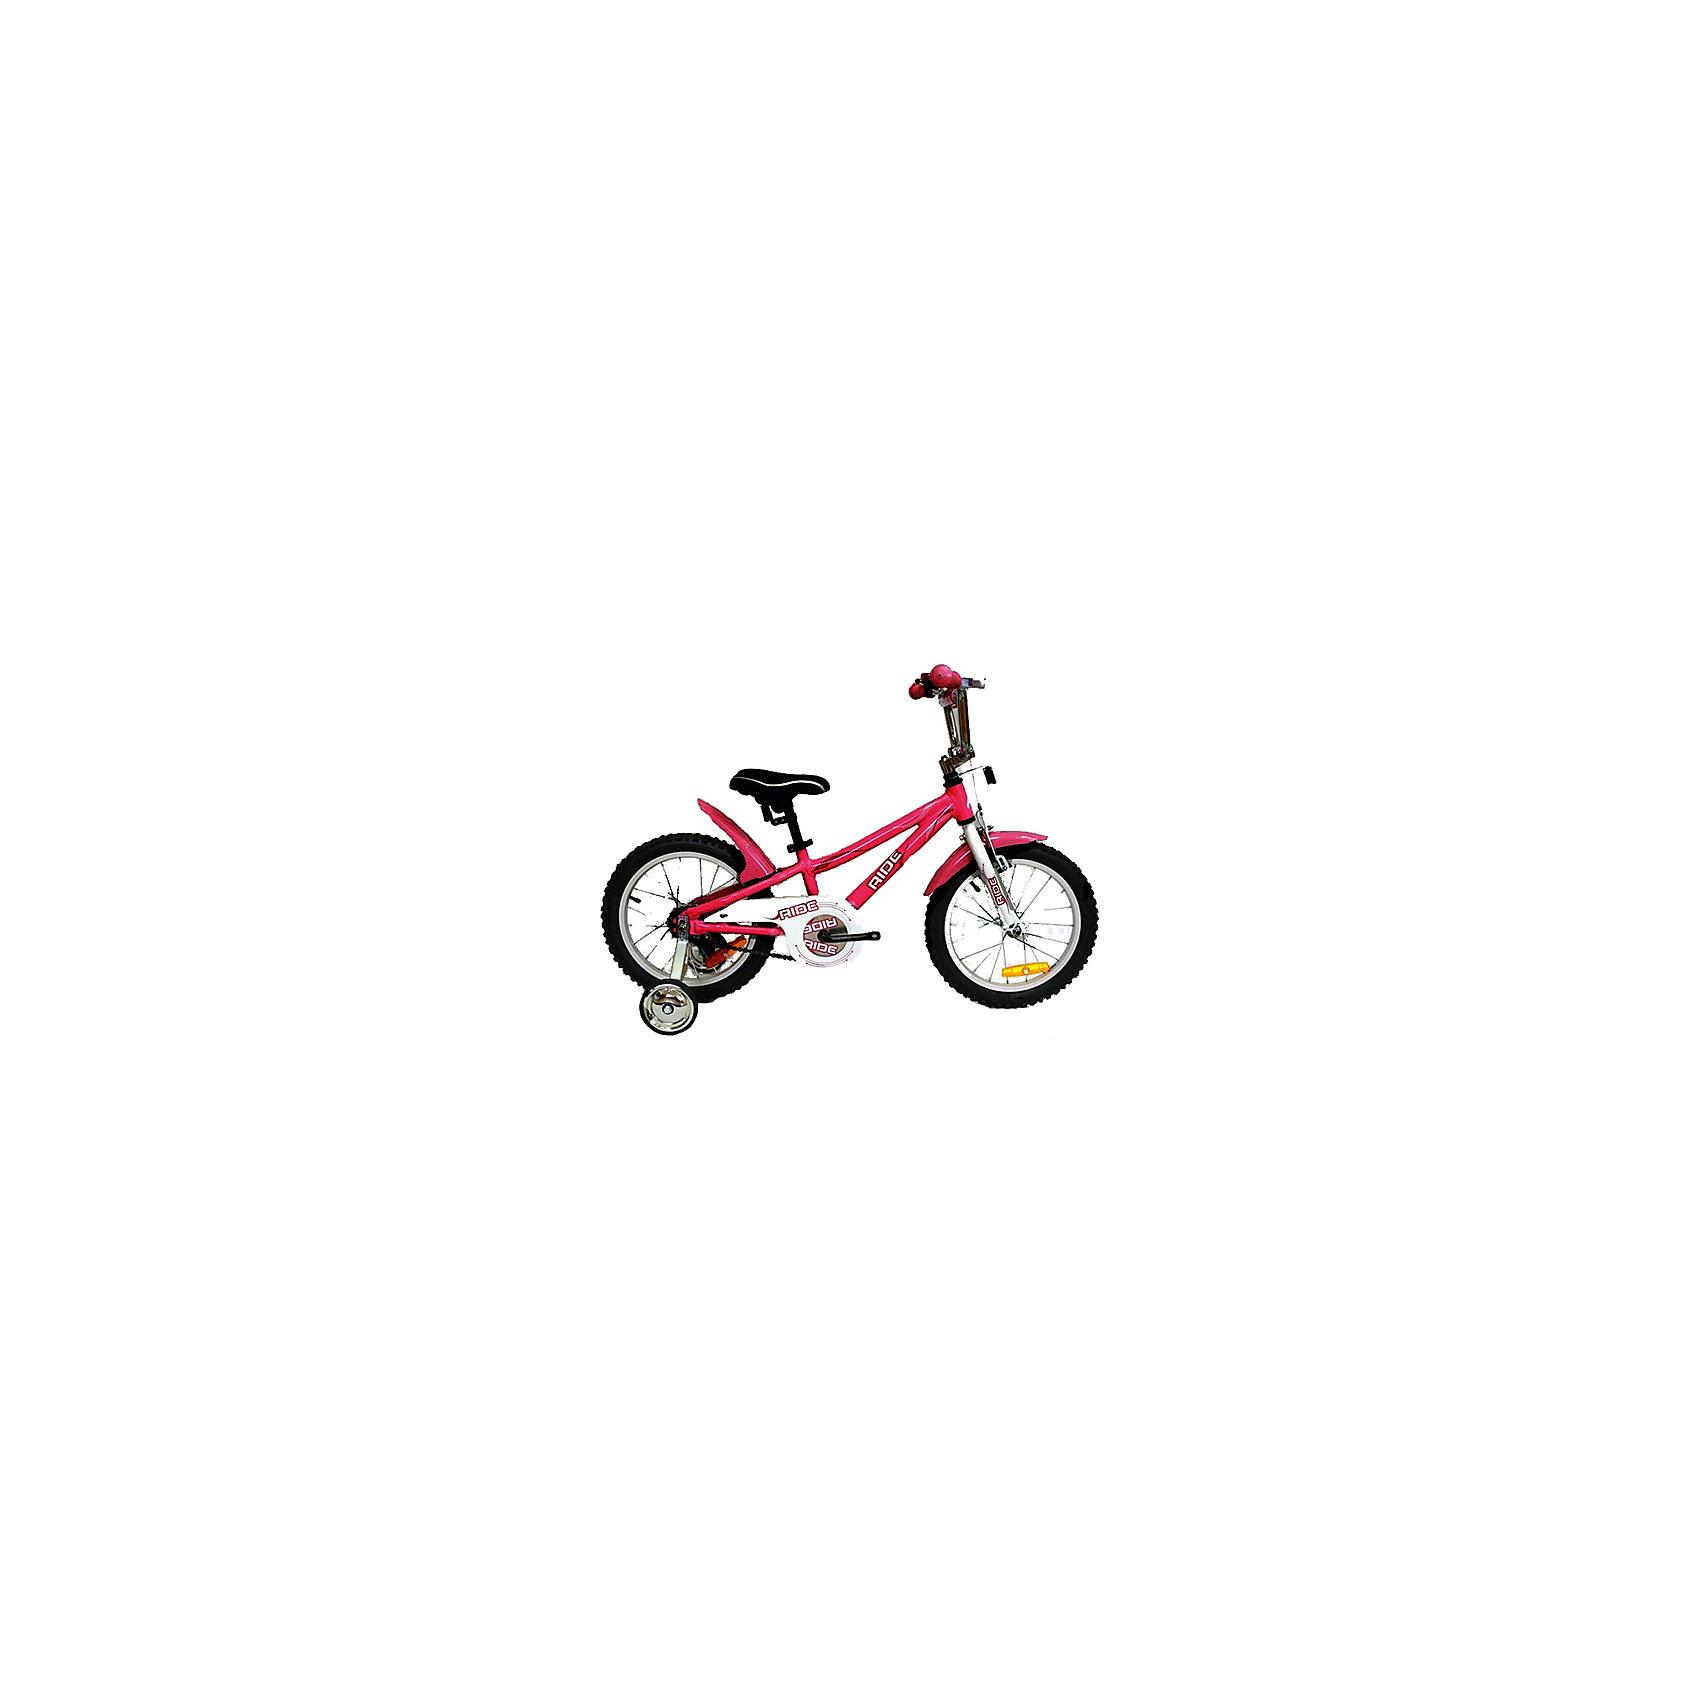 Велосипед RIDE, MARS, темно-розовый<br><br>Ширина мм: 600<br>Глубина мм: 600<br>Высота мм: 1000<br>Вес г: 11200<br>Возраст от месяцев: 36<br>Возраст до месяцев: 84<br>Пол: Унисекс<br>Возраст: Детский<br>SKU: 4785502